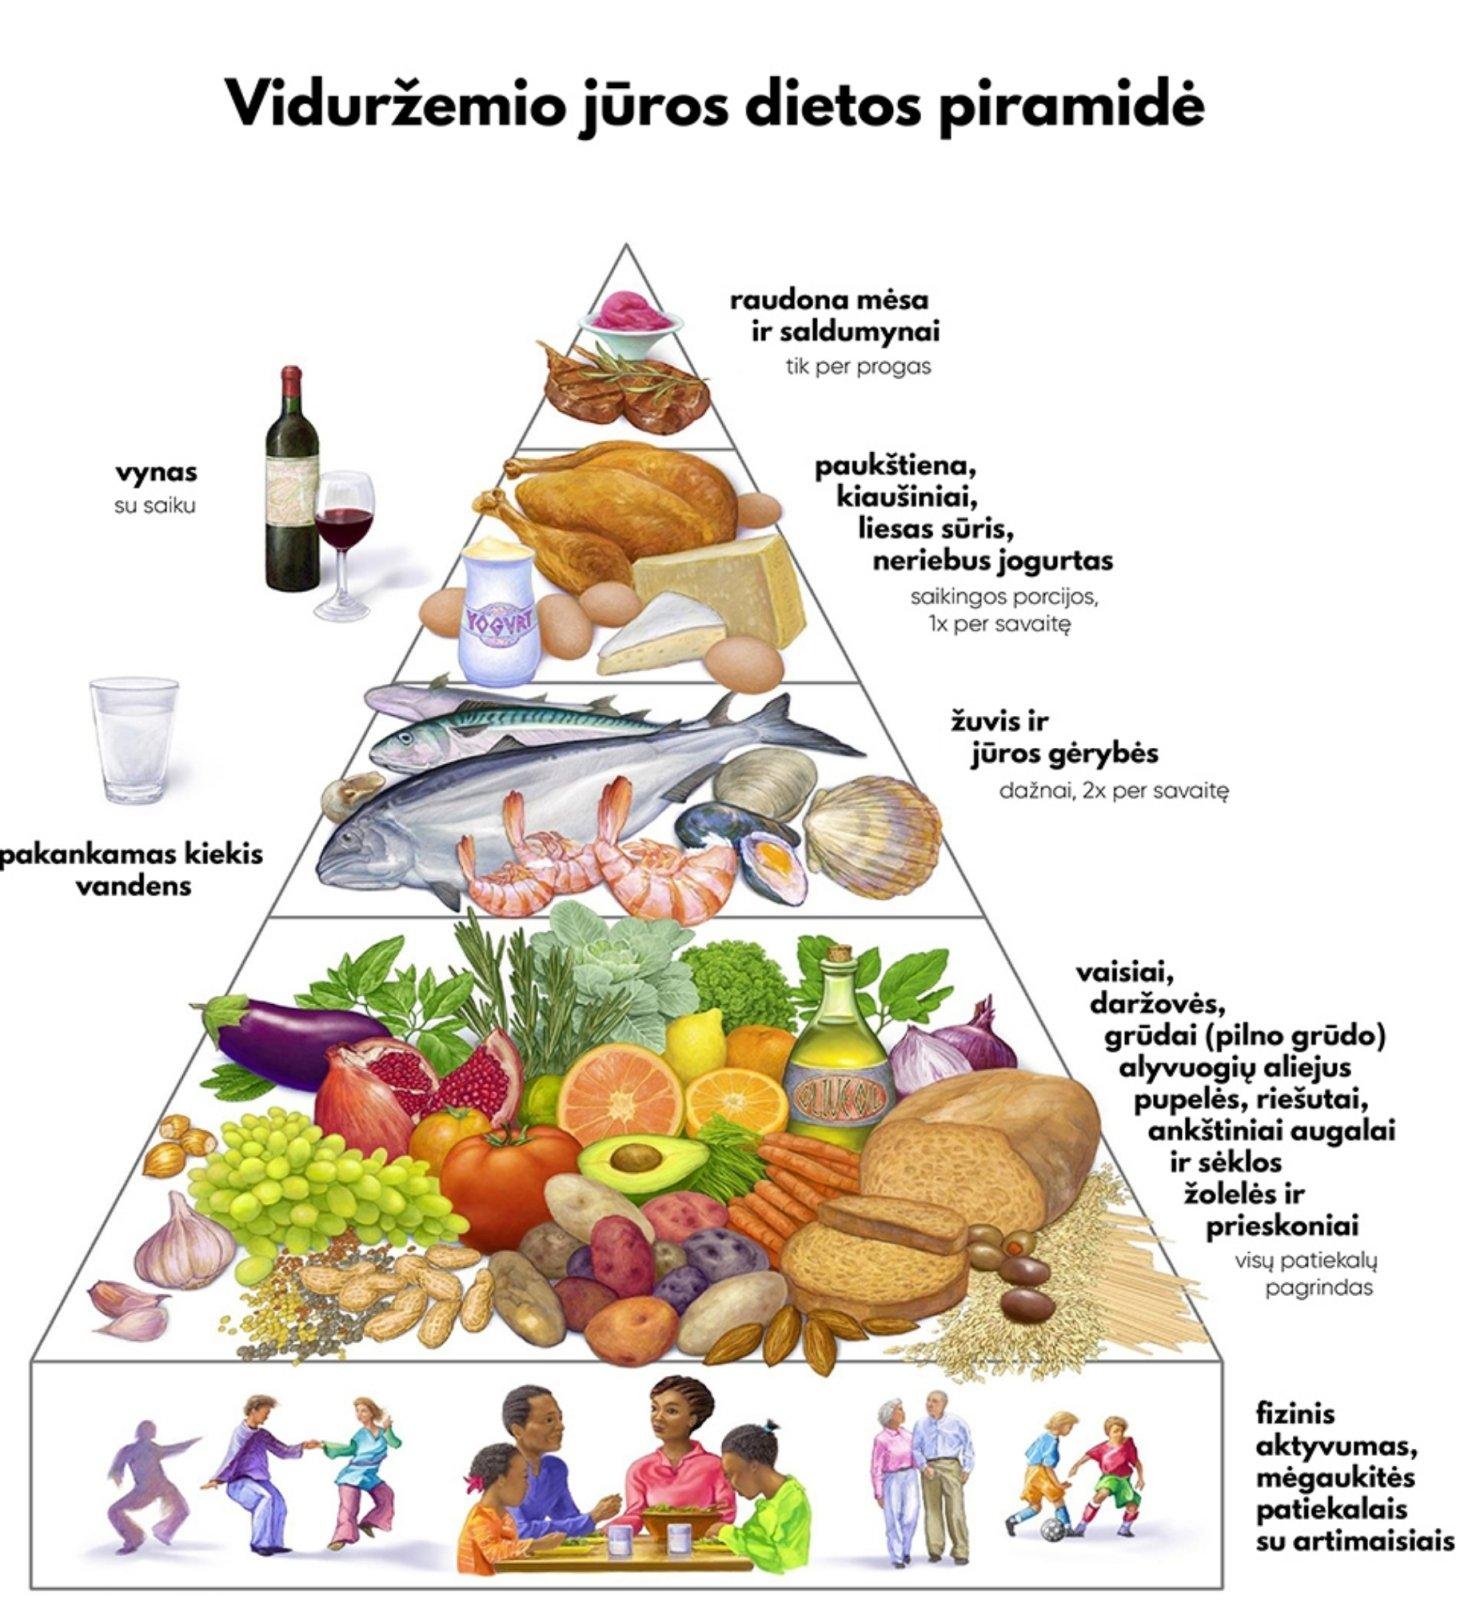 dieta sergant hipertenzija ir padidėjusiu cholesterolio kiekiu